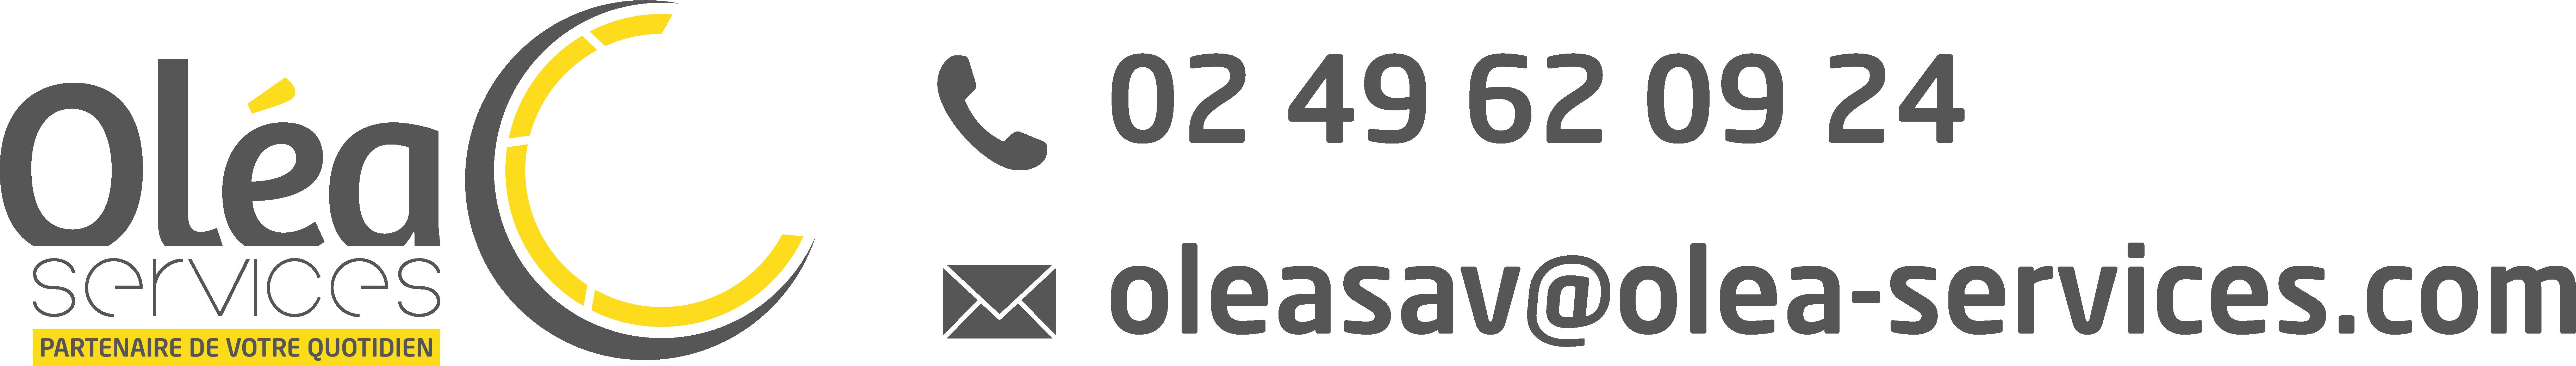 Oléa Services